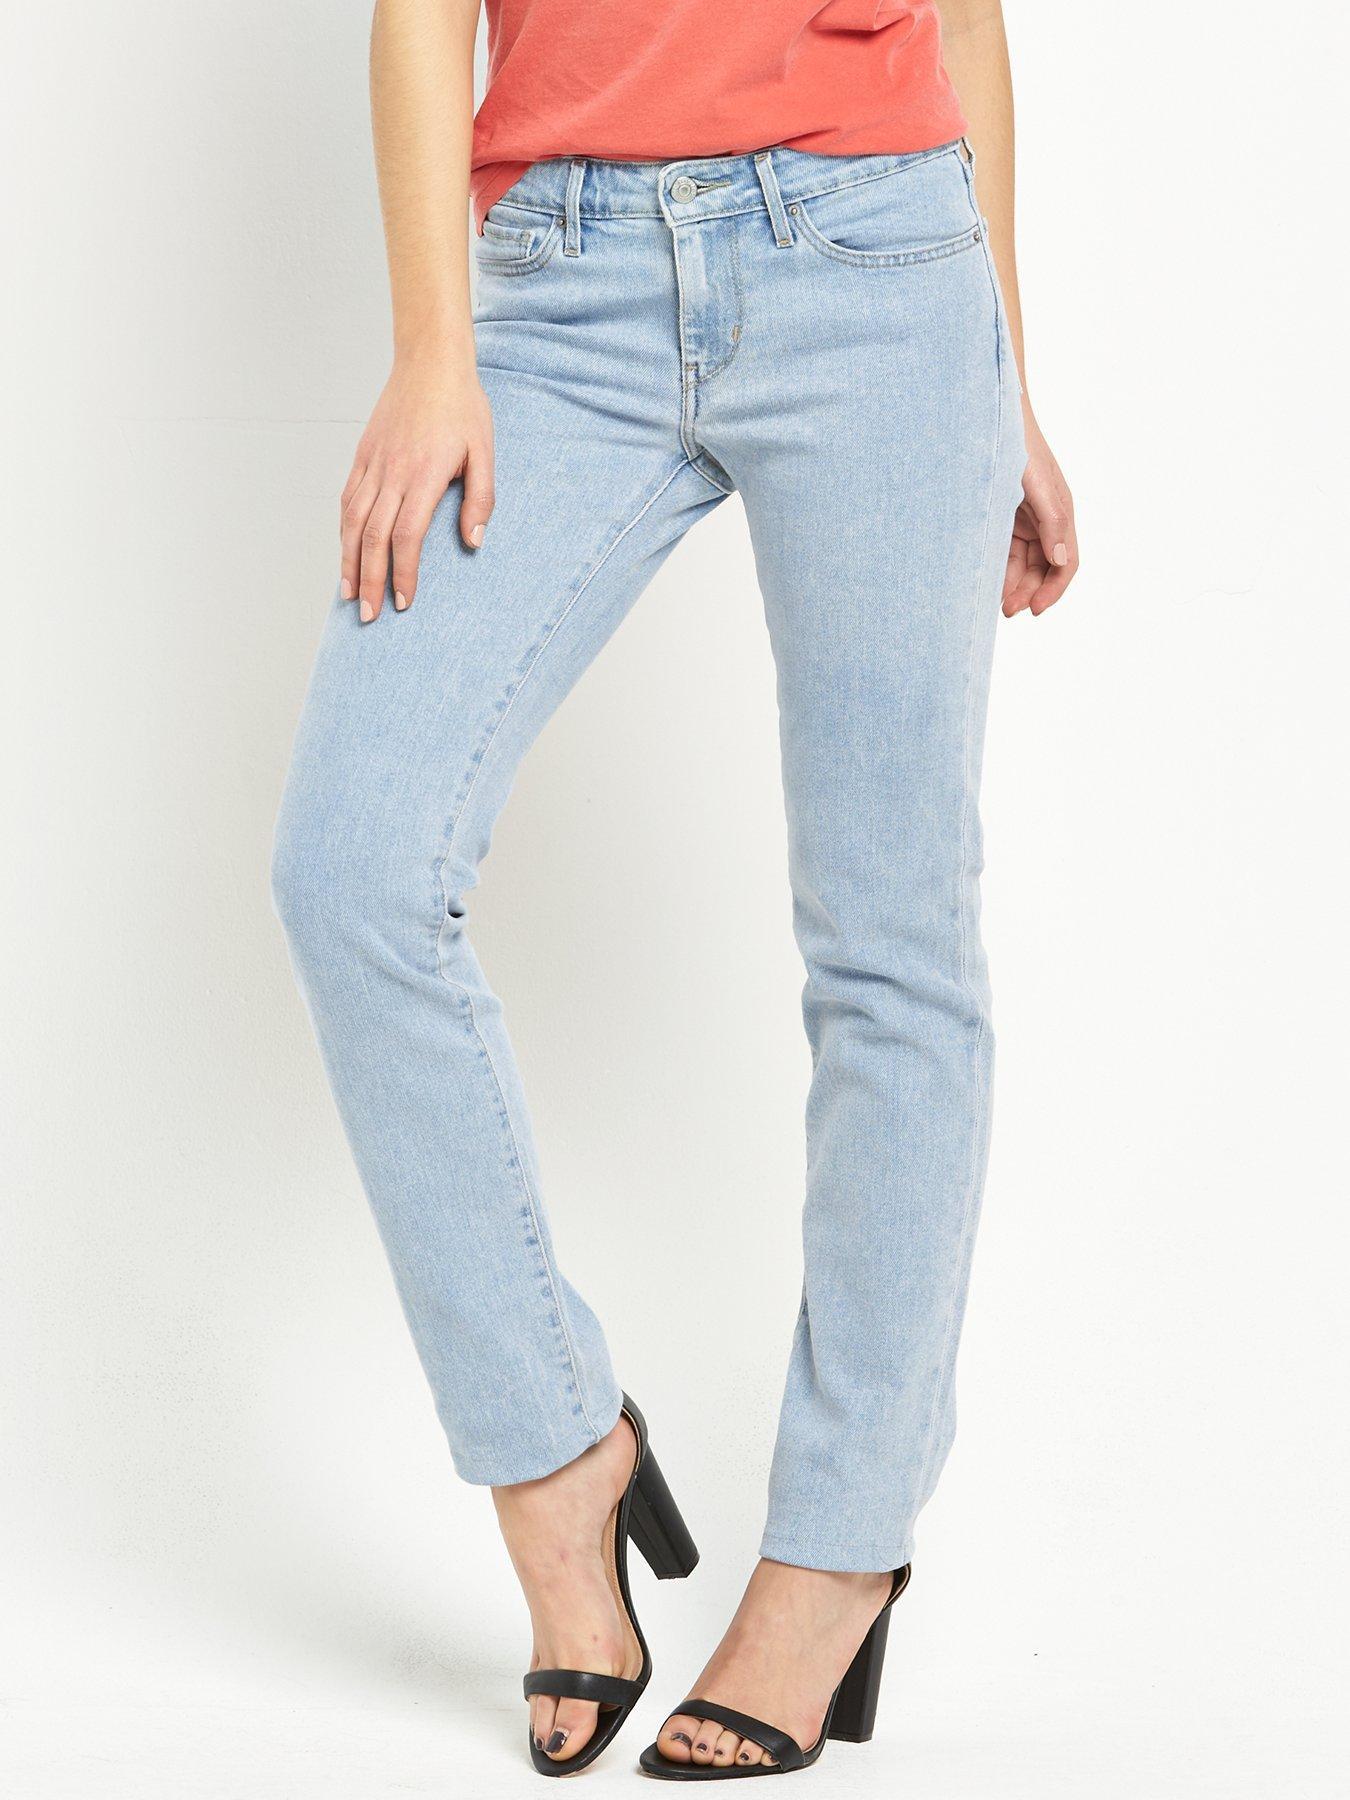 Levi's 721 high rise skinny jeans uk